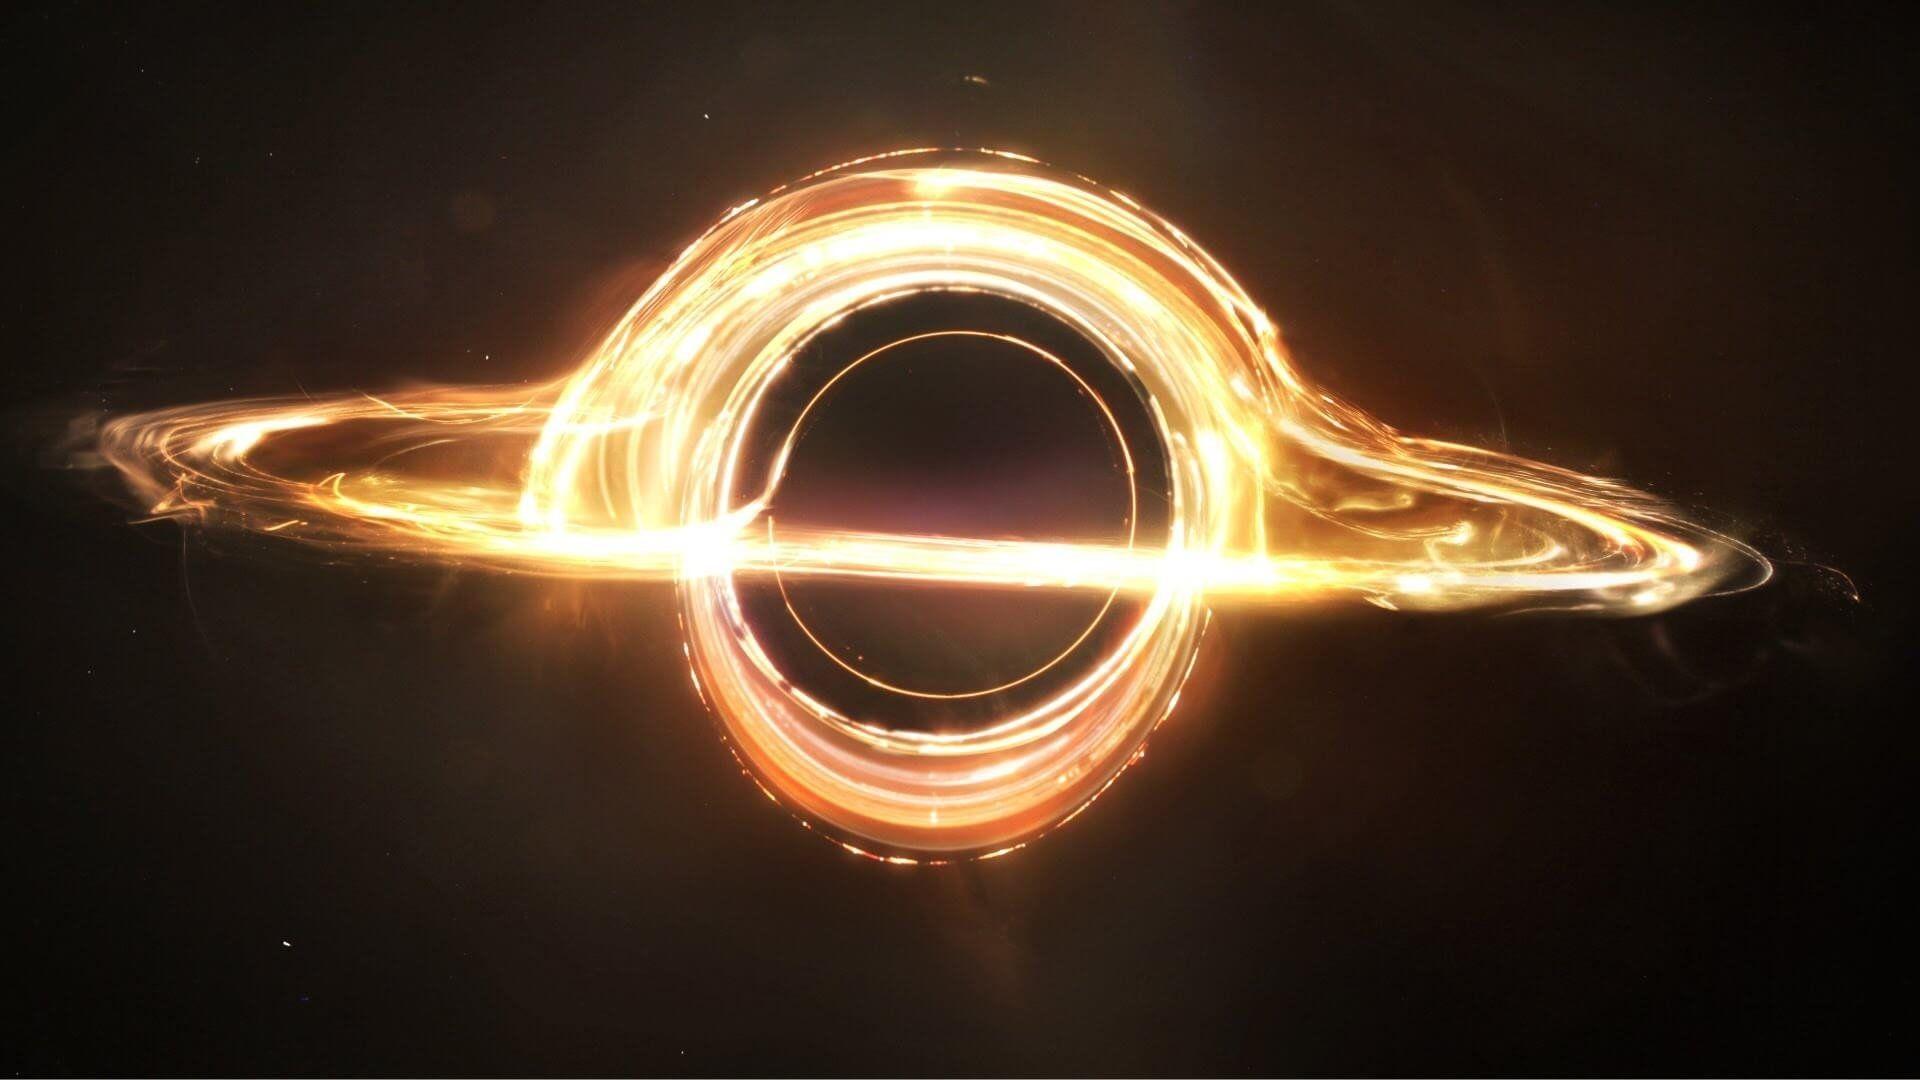 Black Hole Interstellar, Download Wallpaper